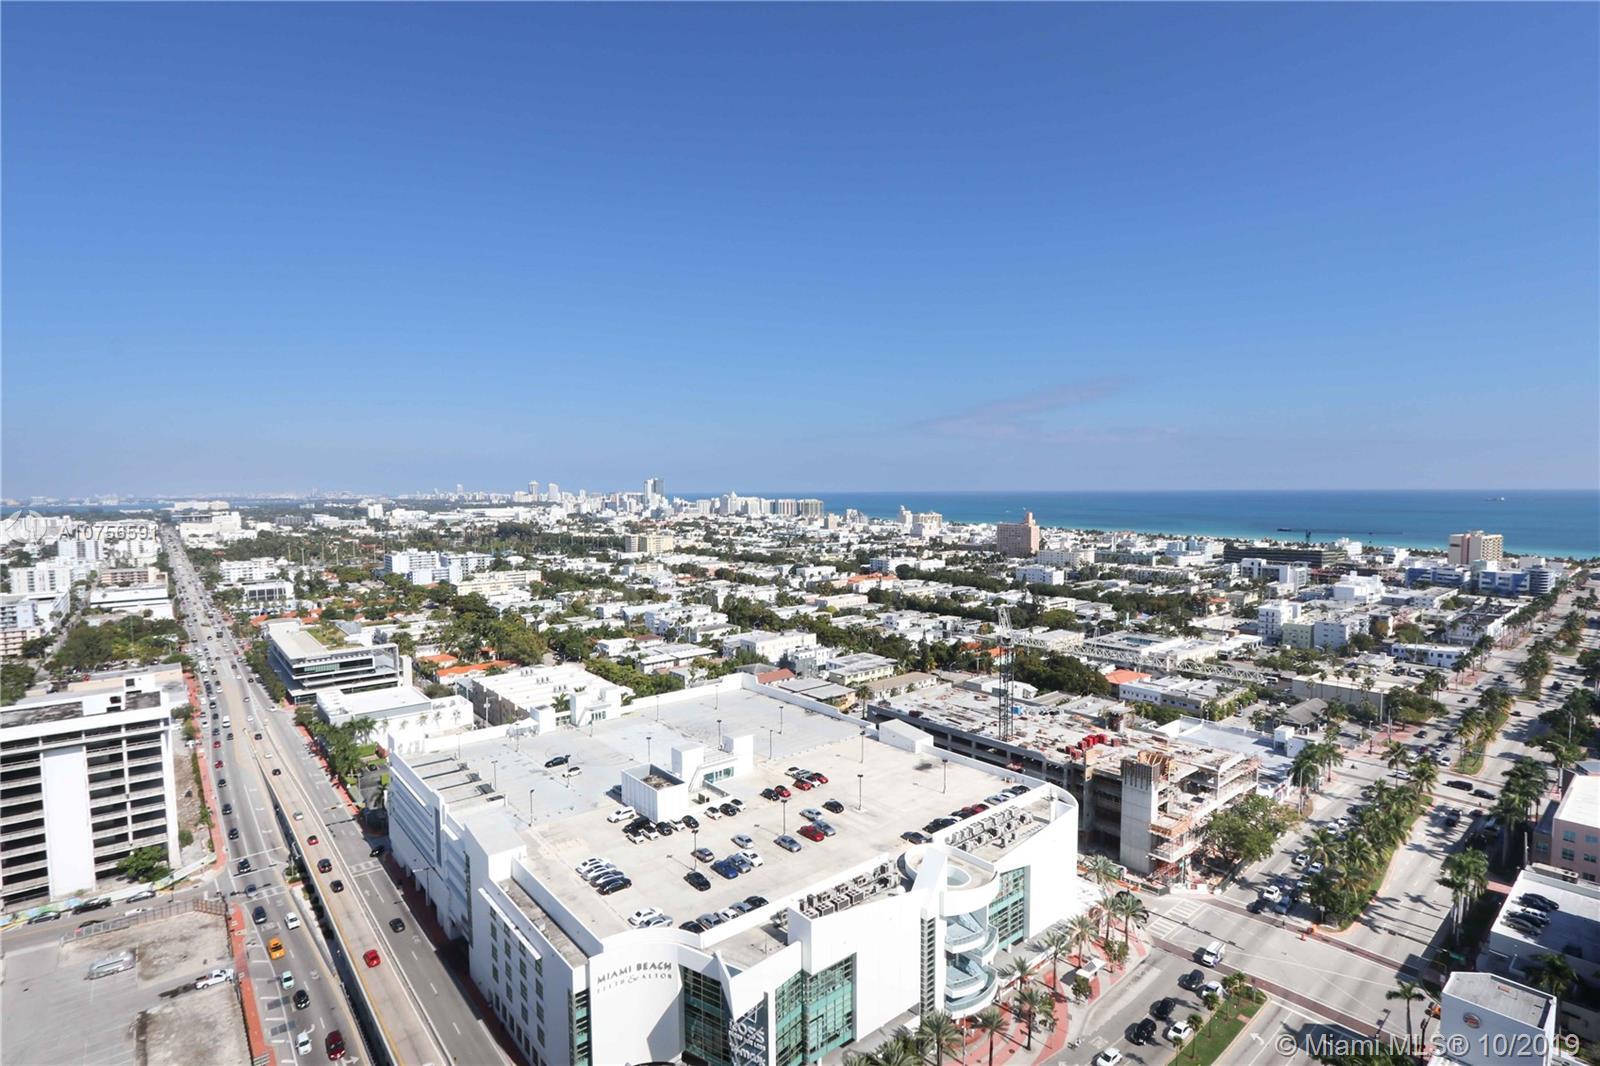 Аренда квартиры по адресу 450 Alton Rd, Miami Beach, FL 33139 в США